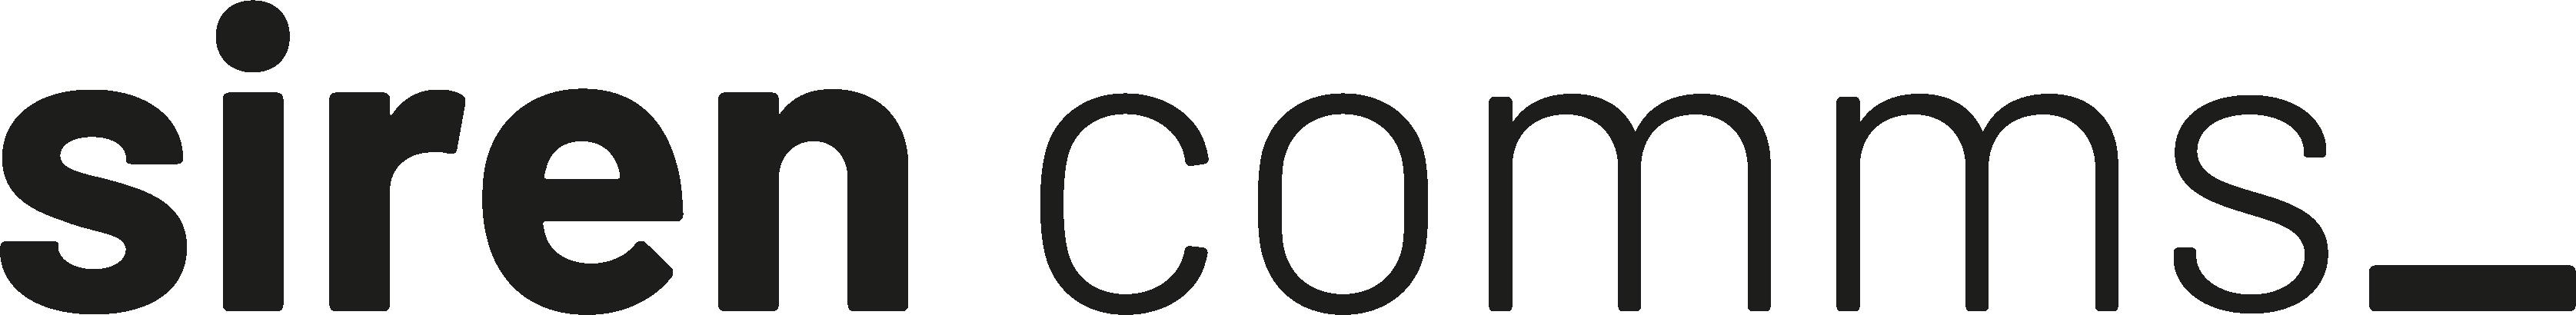 Siren Comms logo